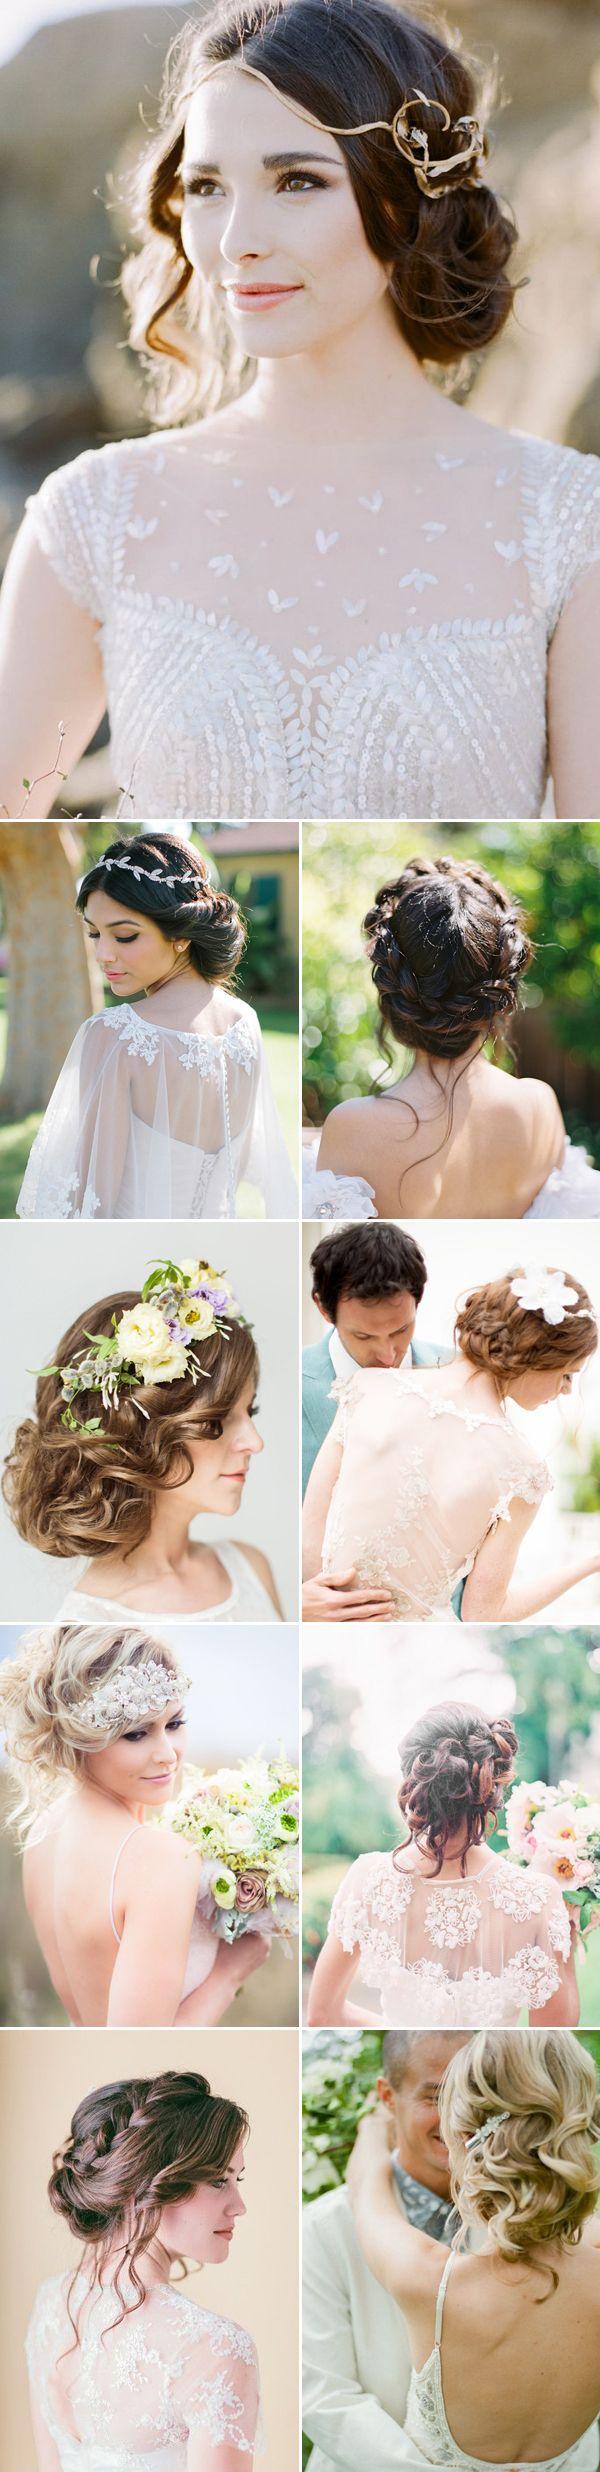 35 best Wedding Hair images on Pinterest